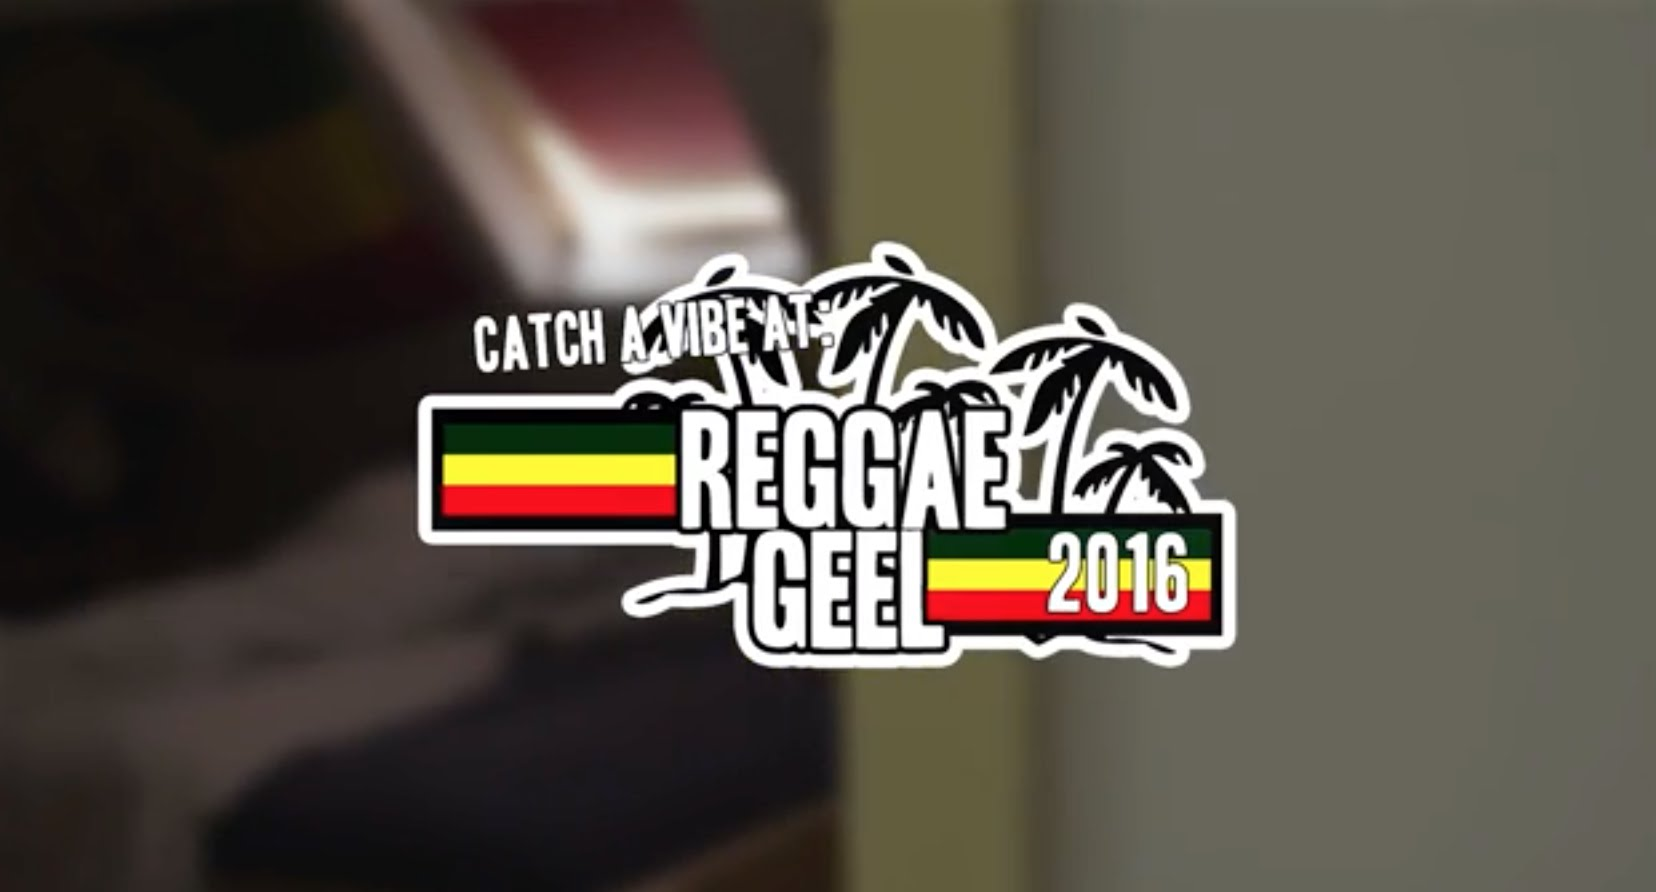 Reggae Geel 2016 - Official Aftermovie [8/23/2016]